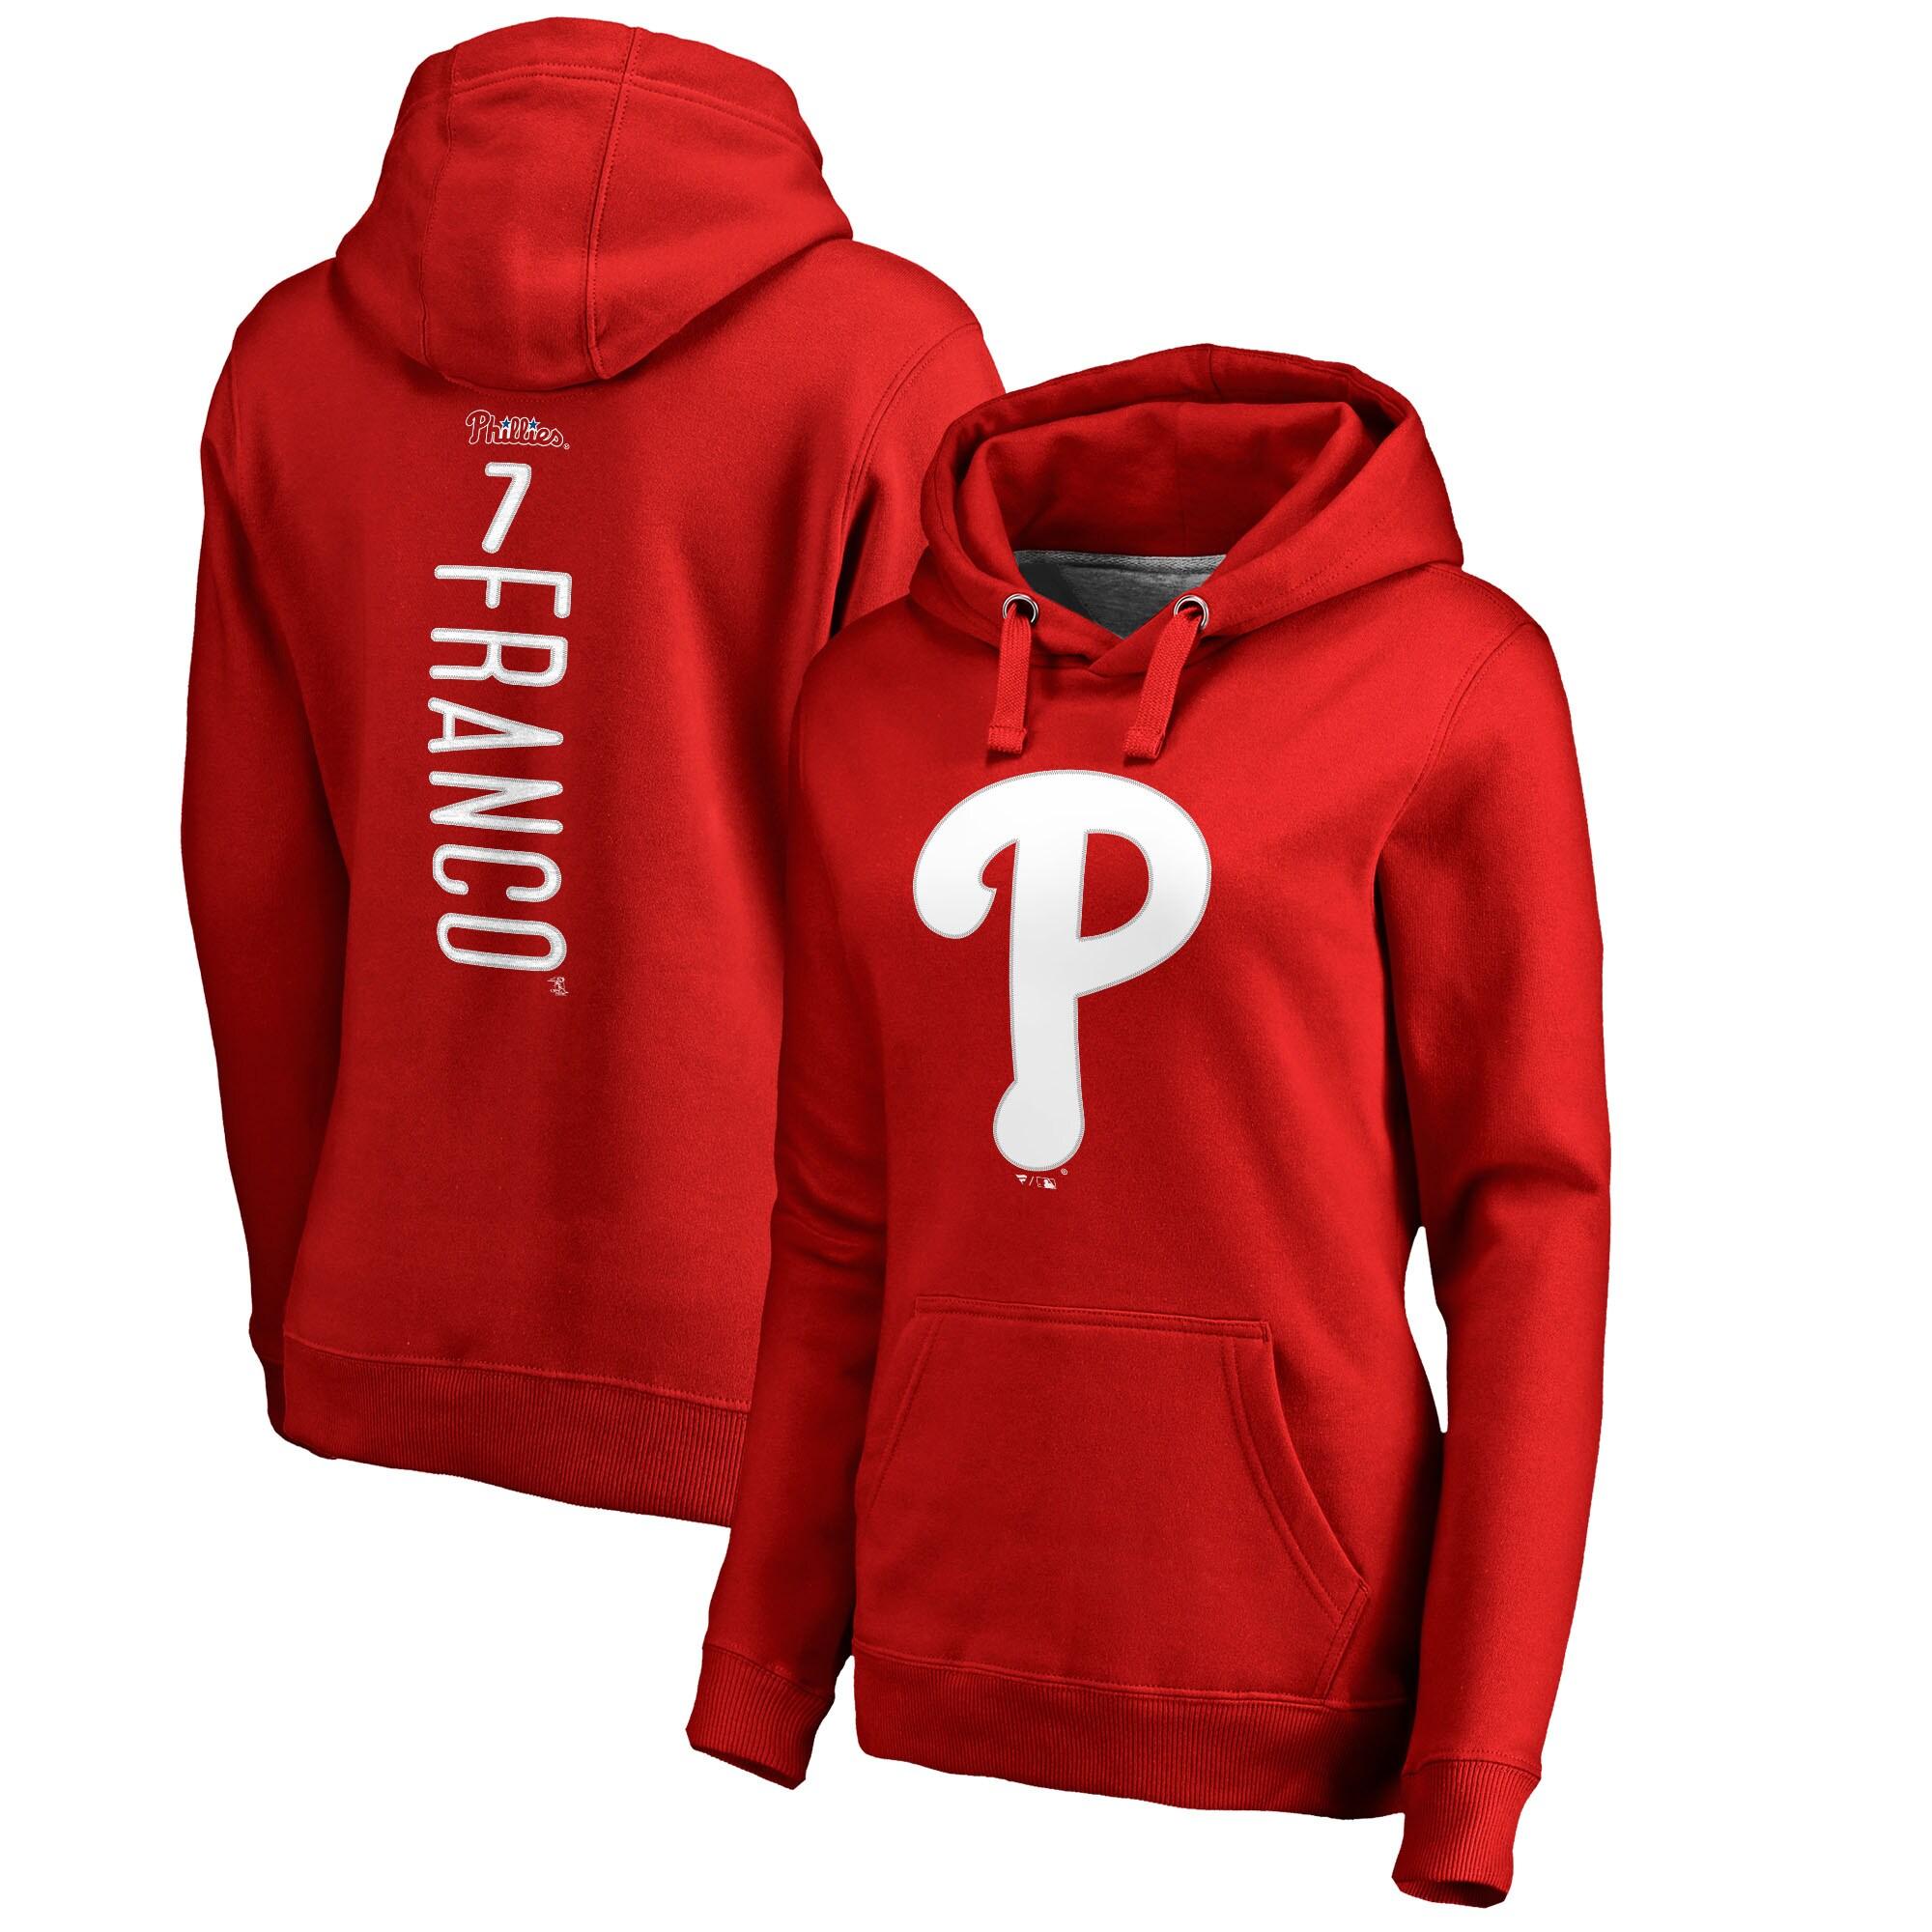 Maikel Franco Philadelphia Phillies Fanatics Branded Women's Backer Pullover Hoodie - Red